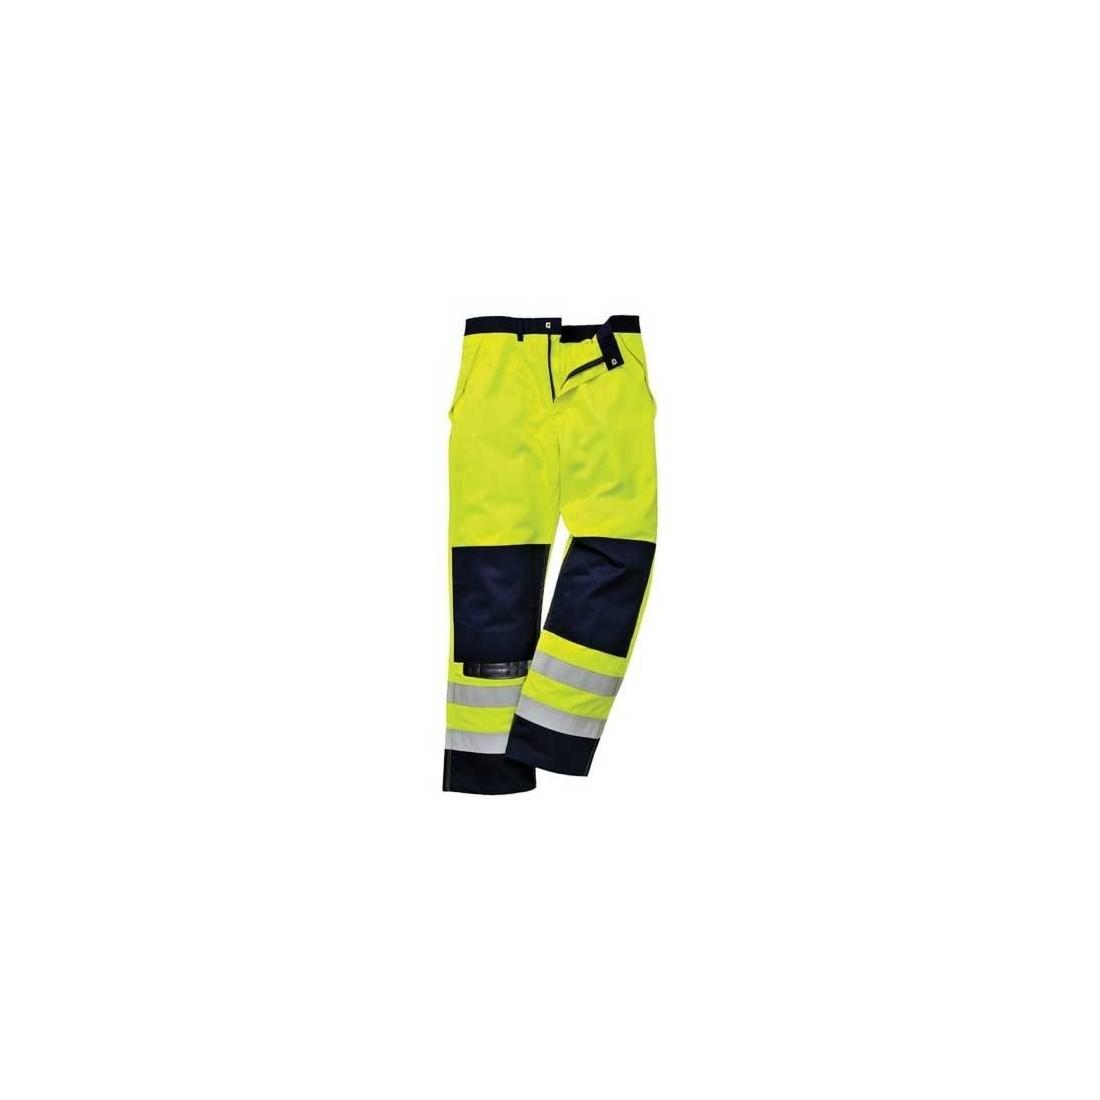 Pantalon FR62 protección contra riesgos químicos